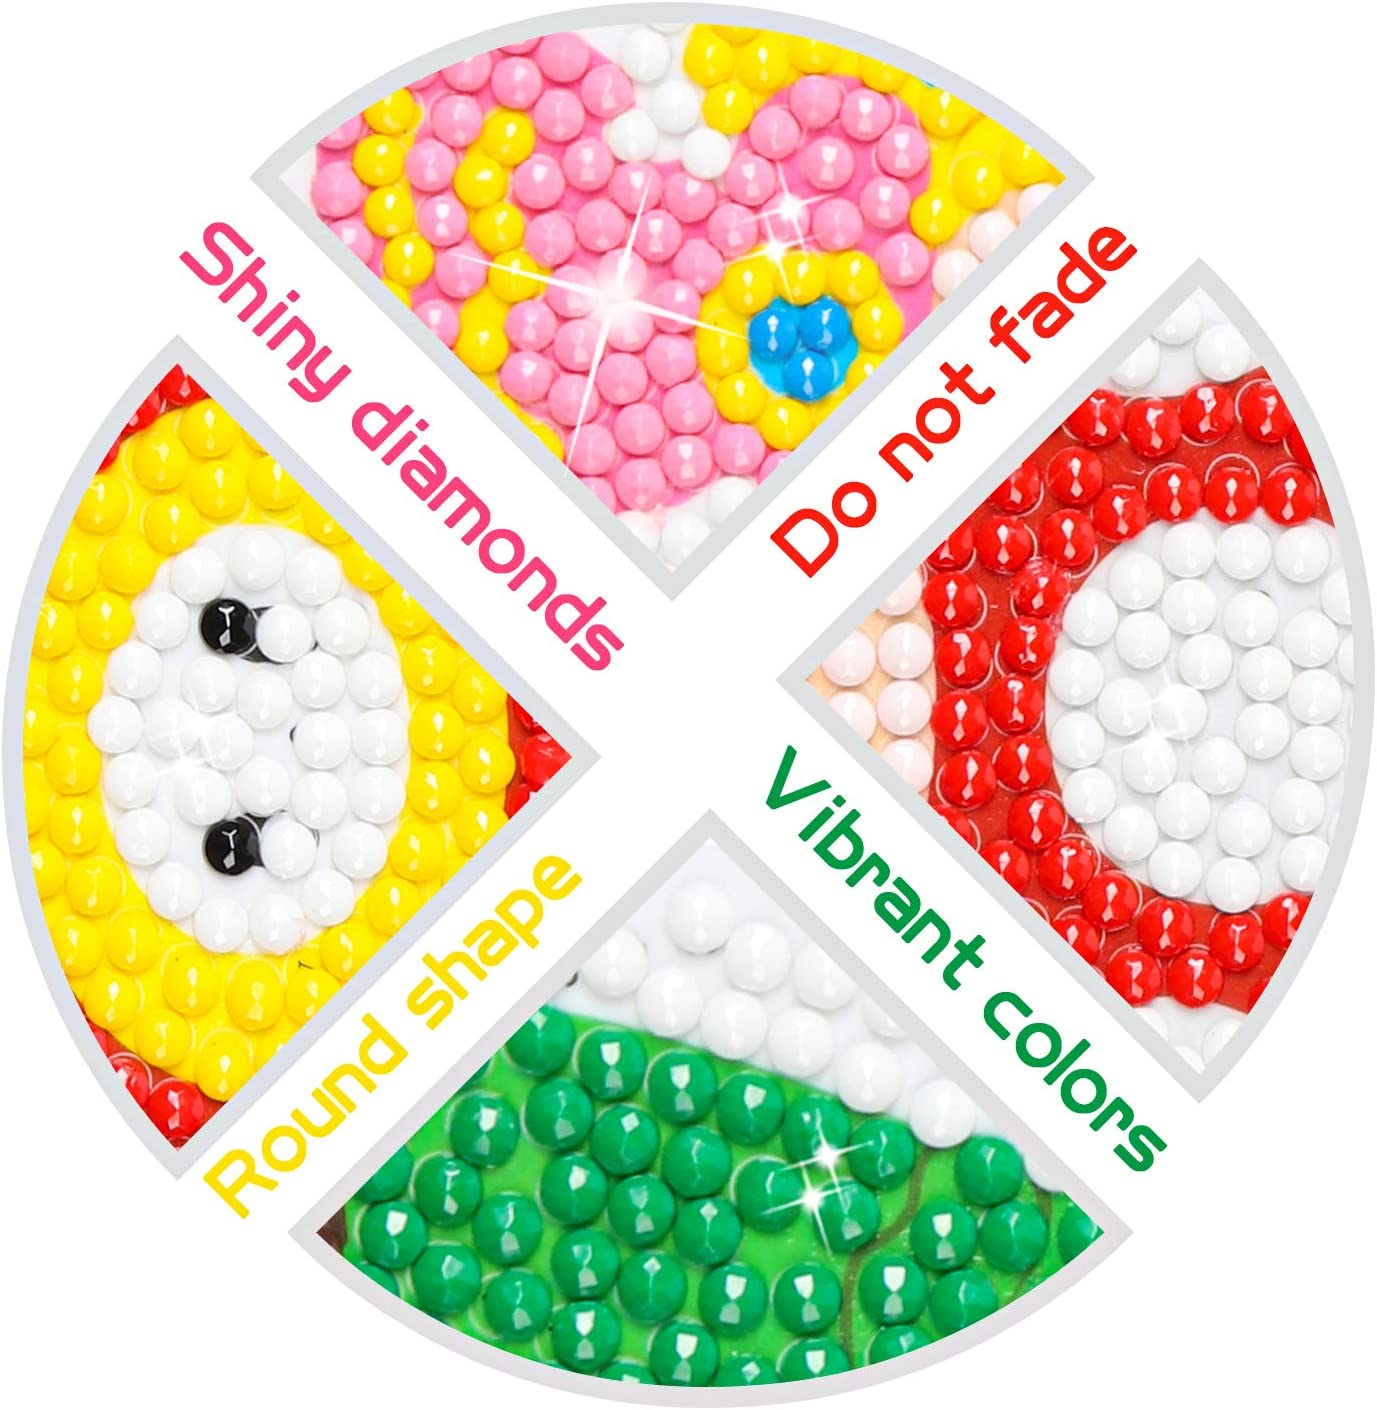 ANGOLIO 5D DIY Diamond Painting Kits 12PCS Mario Themed Stick Full Drill Diamonds Paintings by Number Shine Sparkle Mosaic Stickers DIY Handmade Art Craft Rhinestone Role Stikcers for Kids